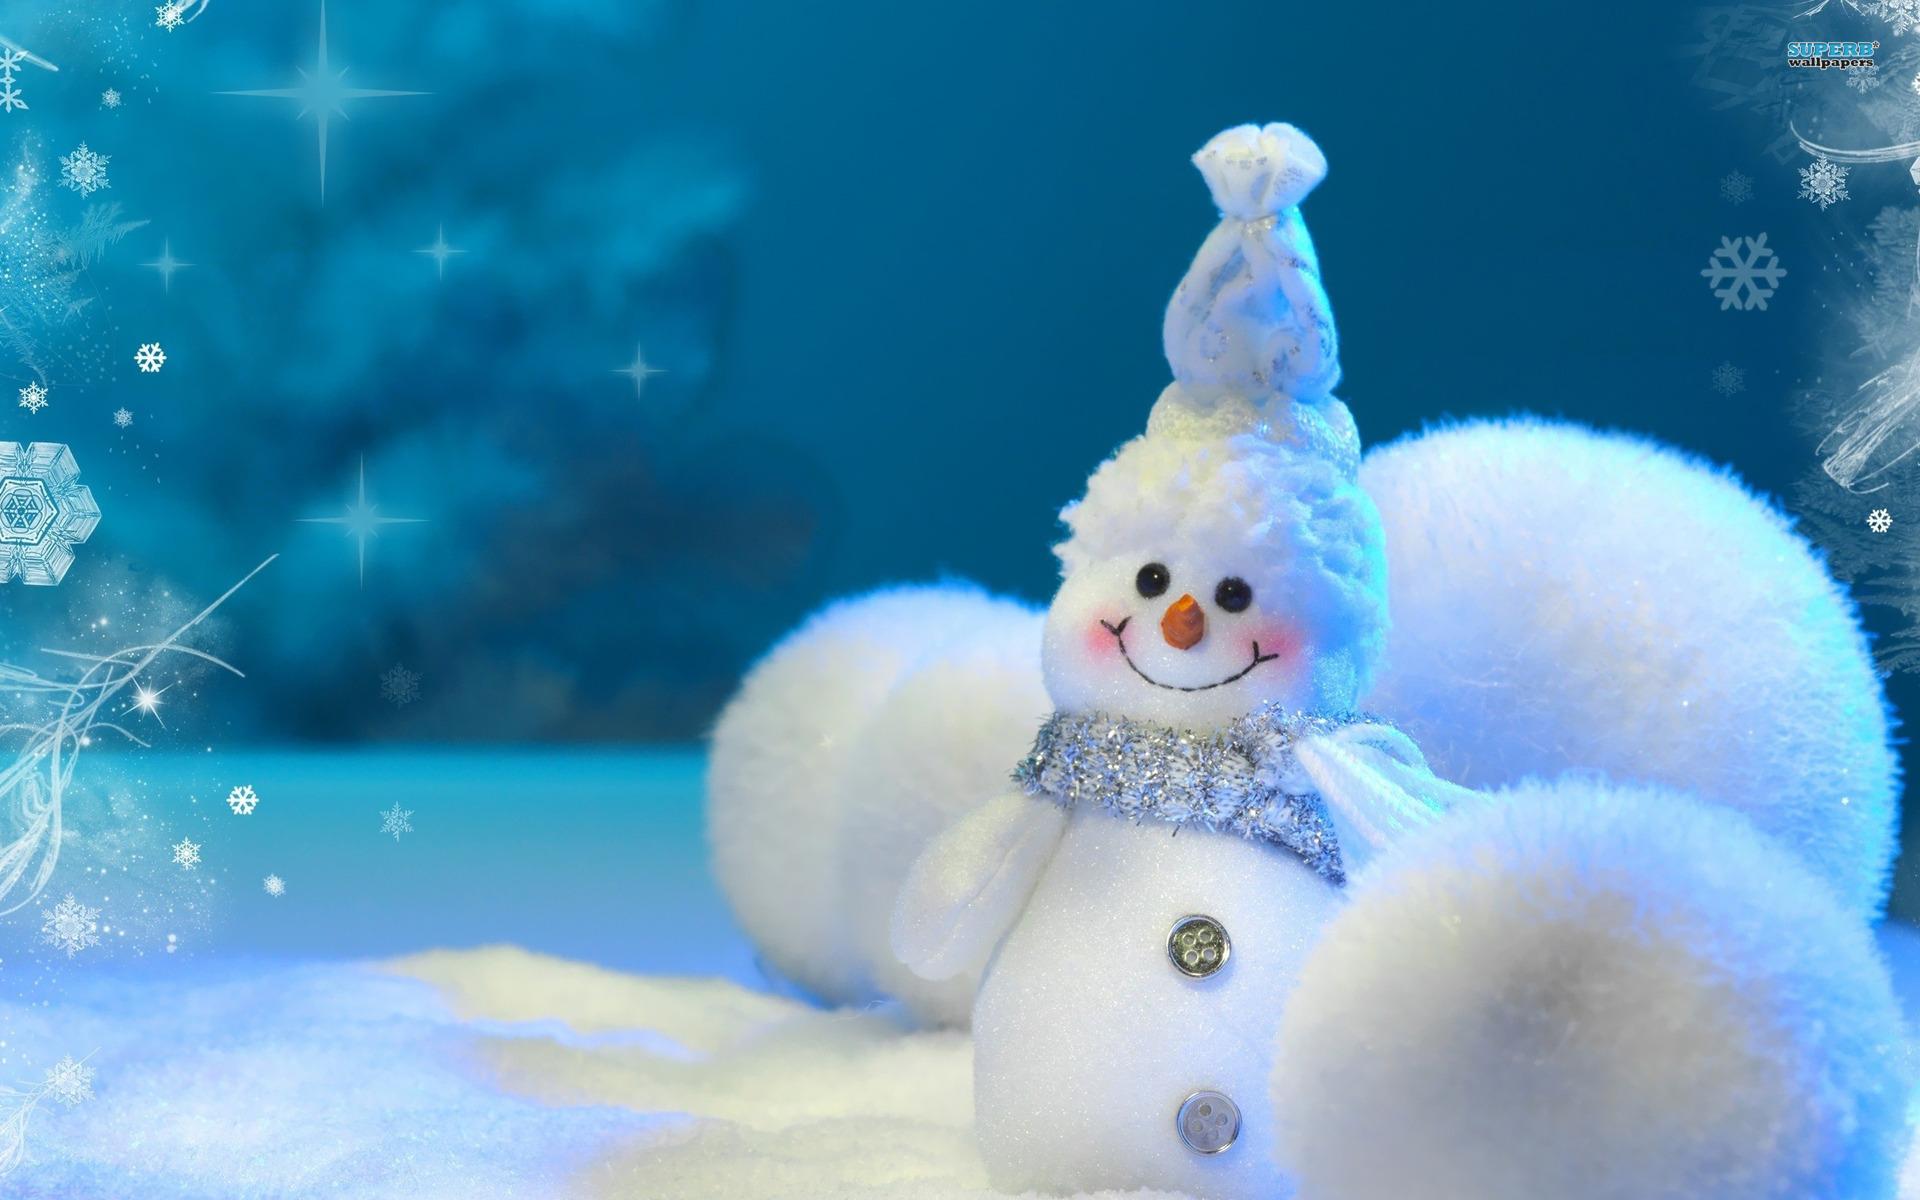 download Christmas Snowman Wallpaper High Quality 462 HD 1920x1200